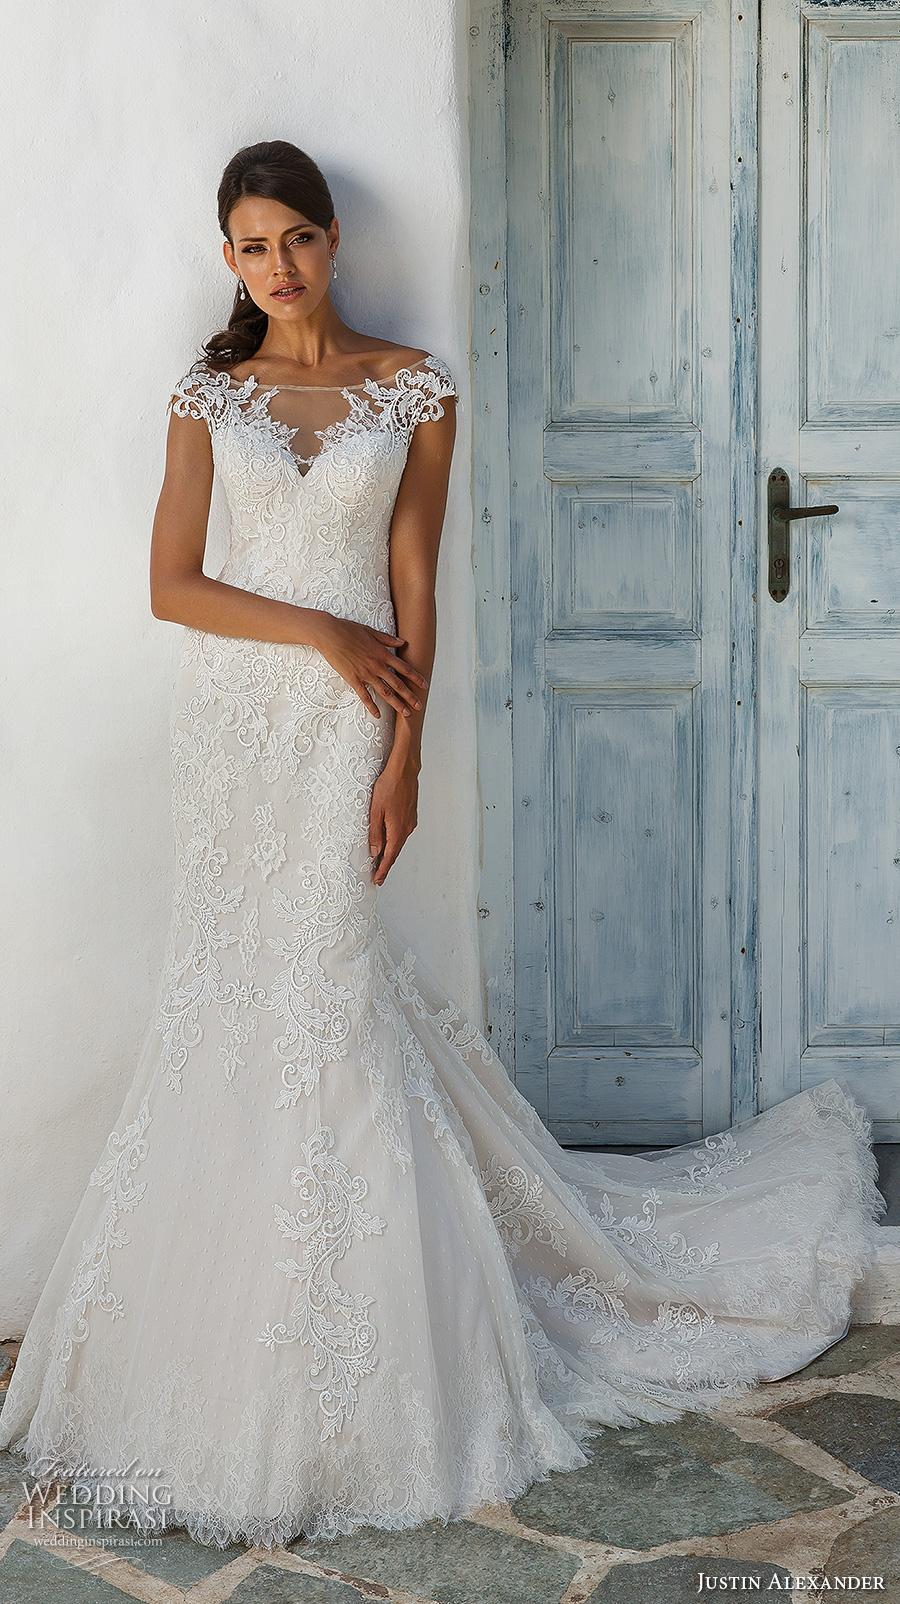 28002d7fc69 justin alexander 2018 bridal cap sleeves illusion off the shoulder sweetheart  neckline full embellishment elegant fit